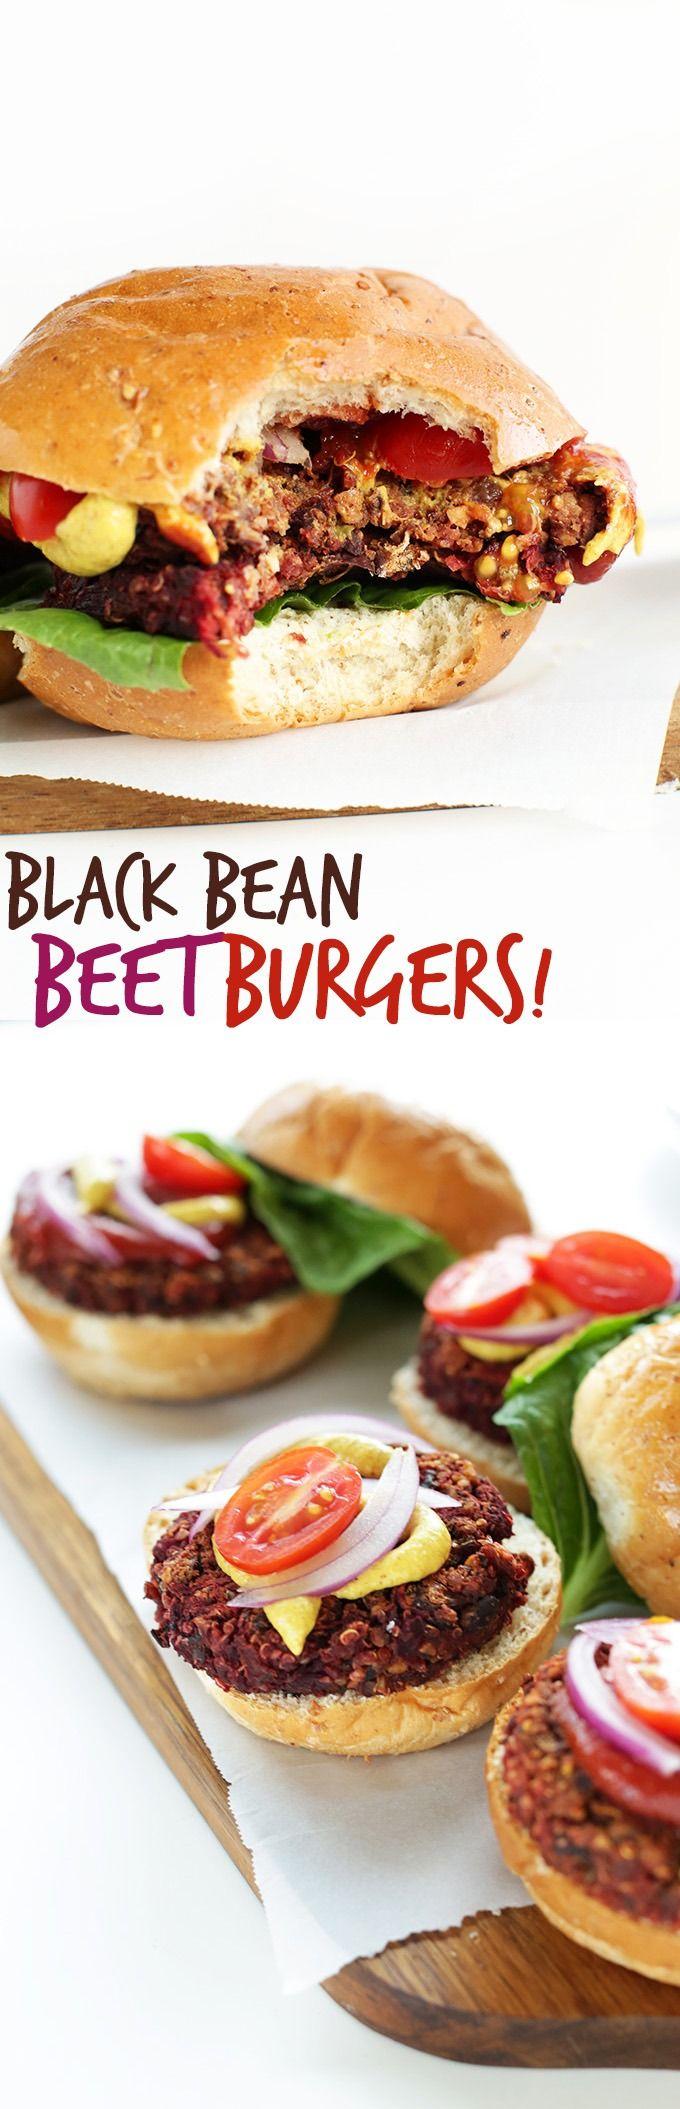 10-ingredient SUPER flavor veggie burgers loaded with healthy ingredients like black beans, beet and quinoa! #vegan #glutenfree